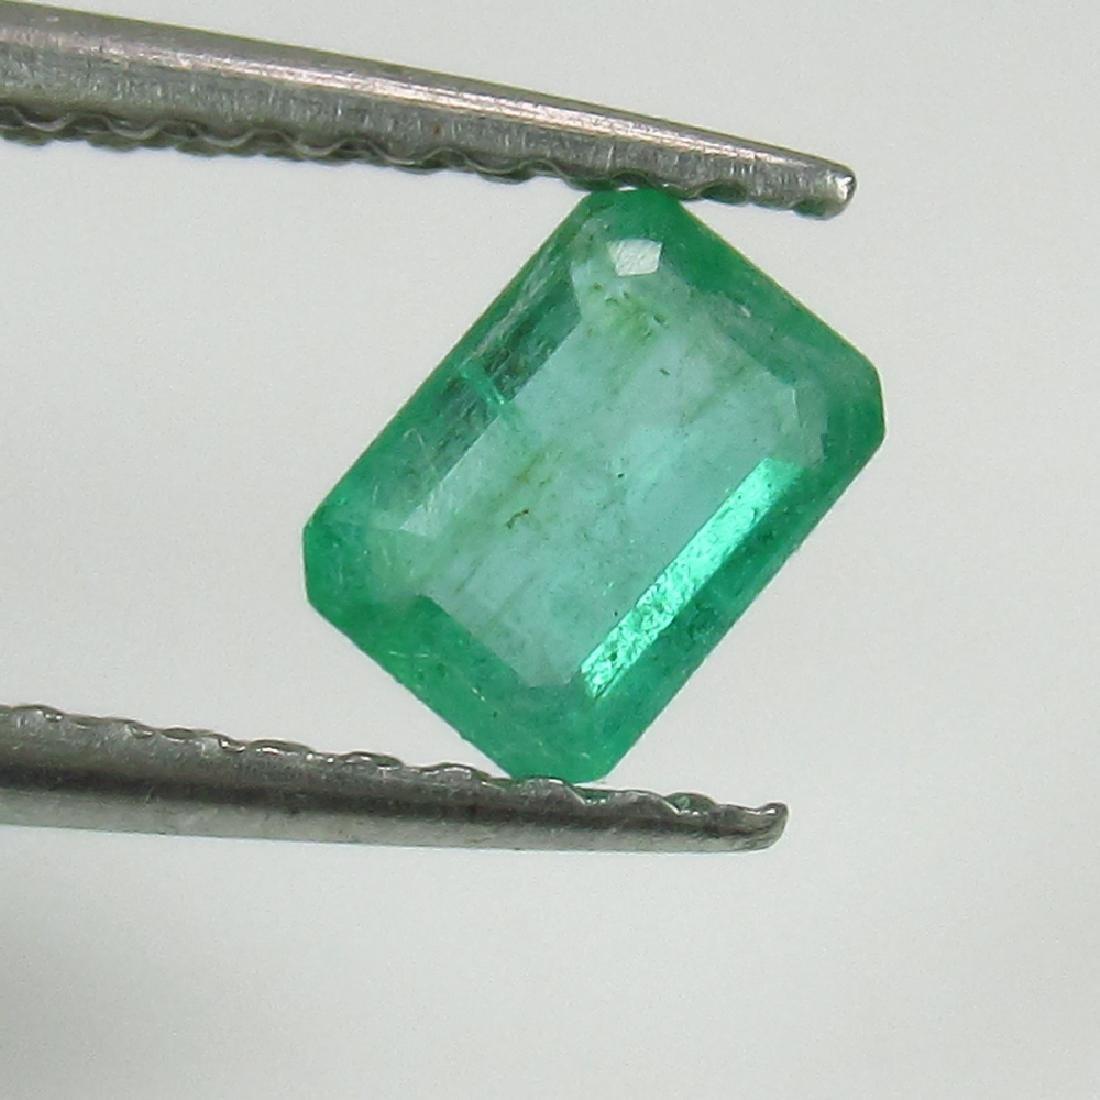 0.39 Ct Genuine Zambian Emerald 5X3.5 mm Octagon Cut